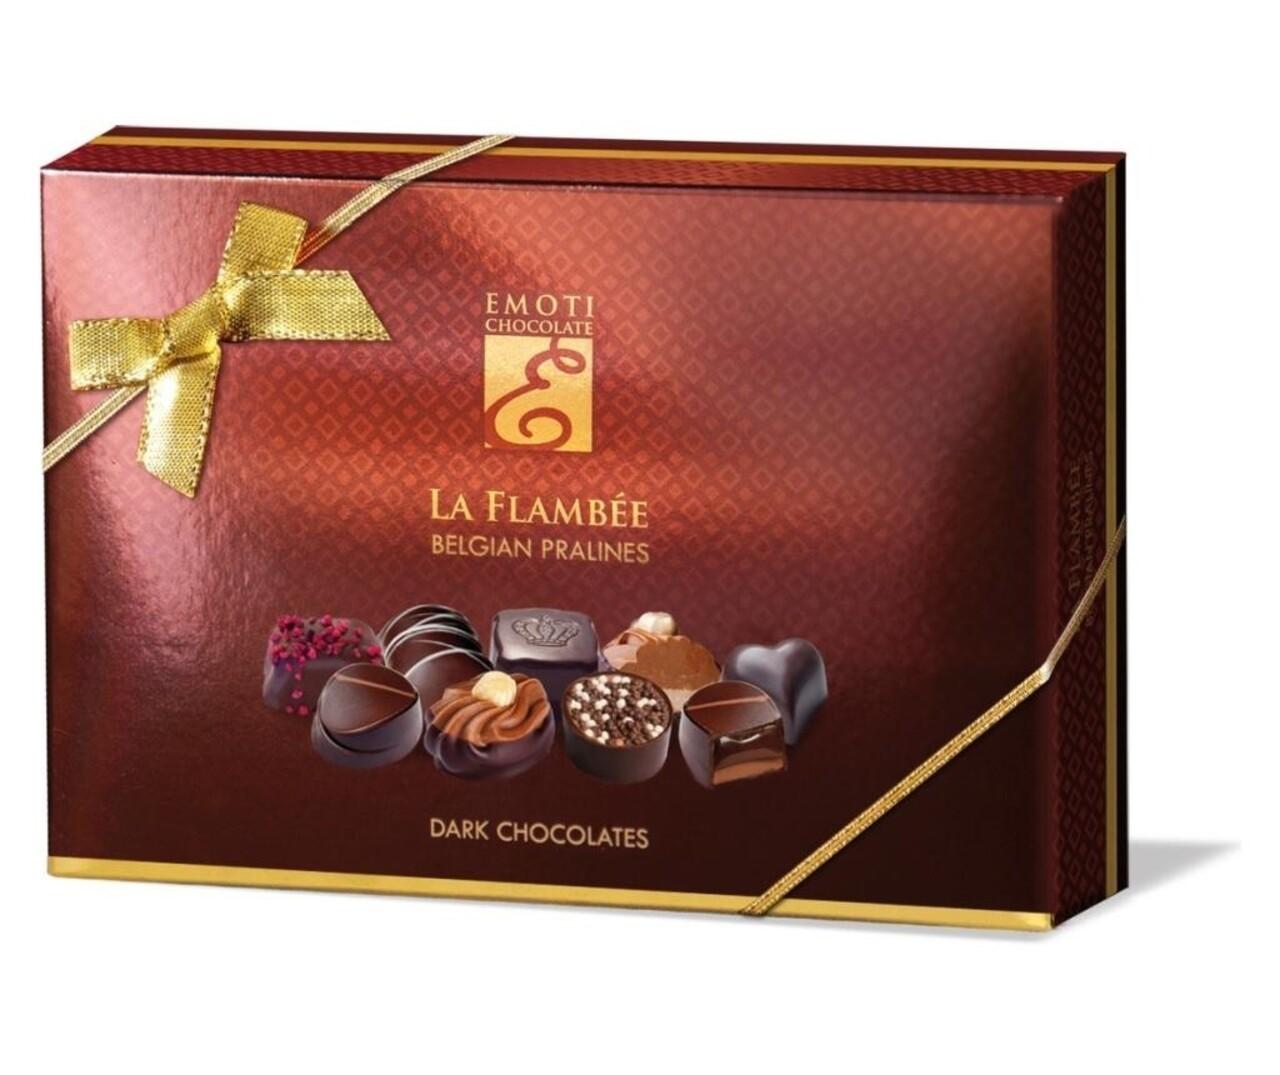 Praline Asortate Din Ciocolata Neagra La Flambee, Emoti, 120G, Belgia